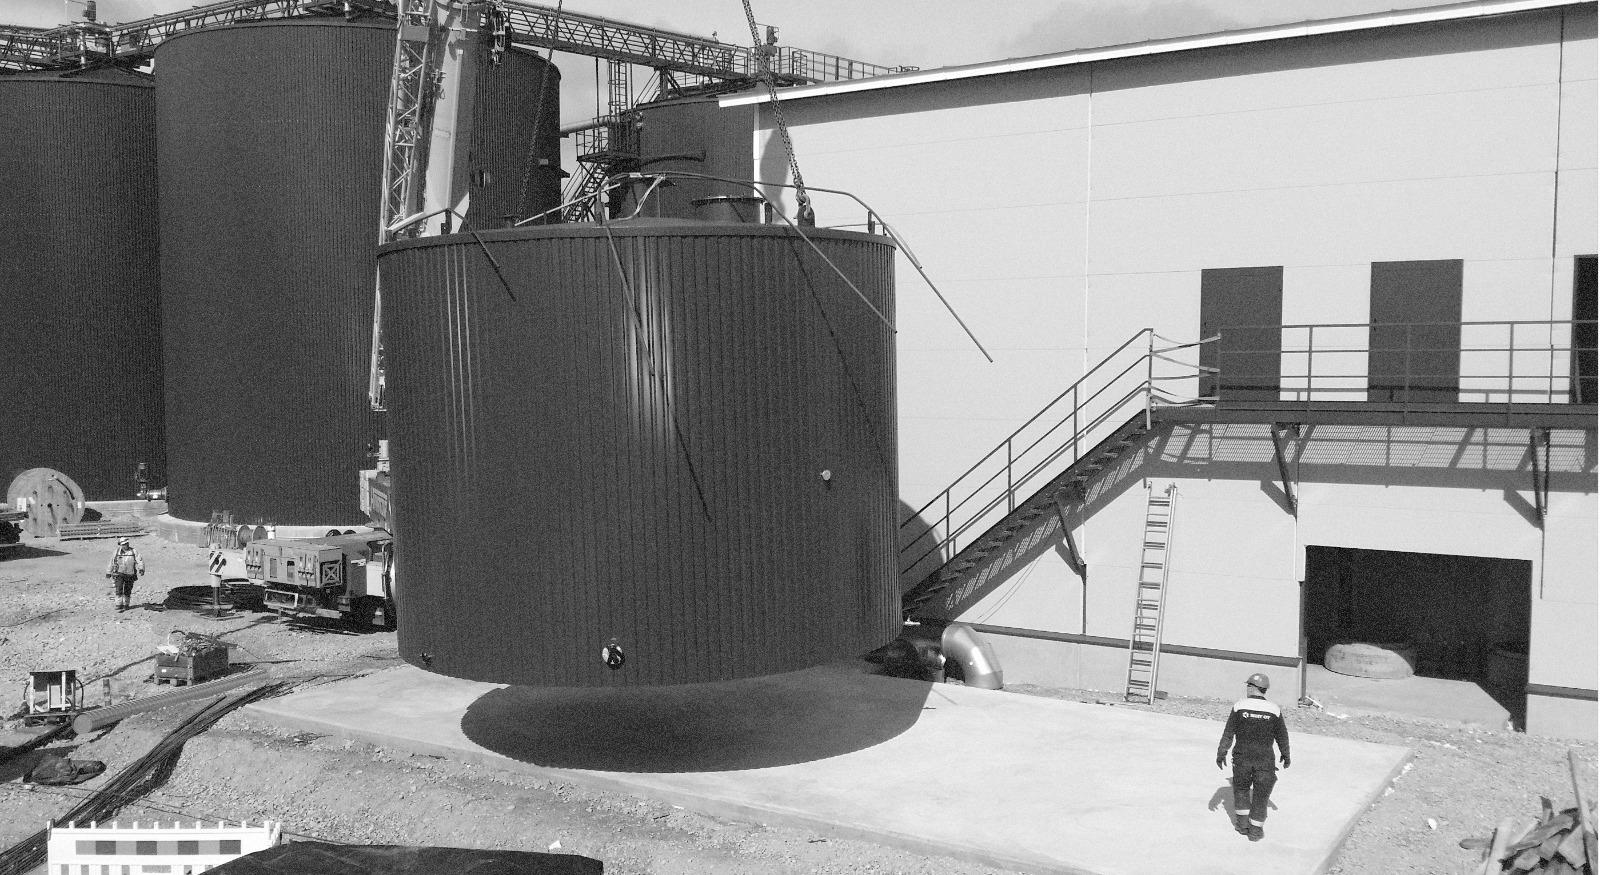 Biogas plant expansion, Gasum Oy, Riihimäki